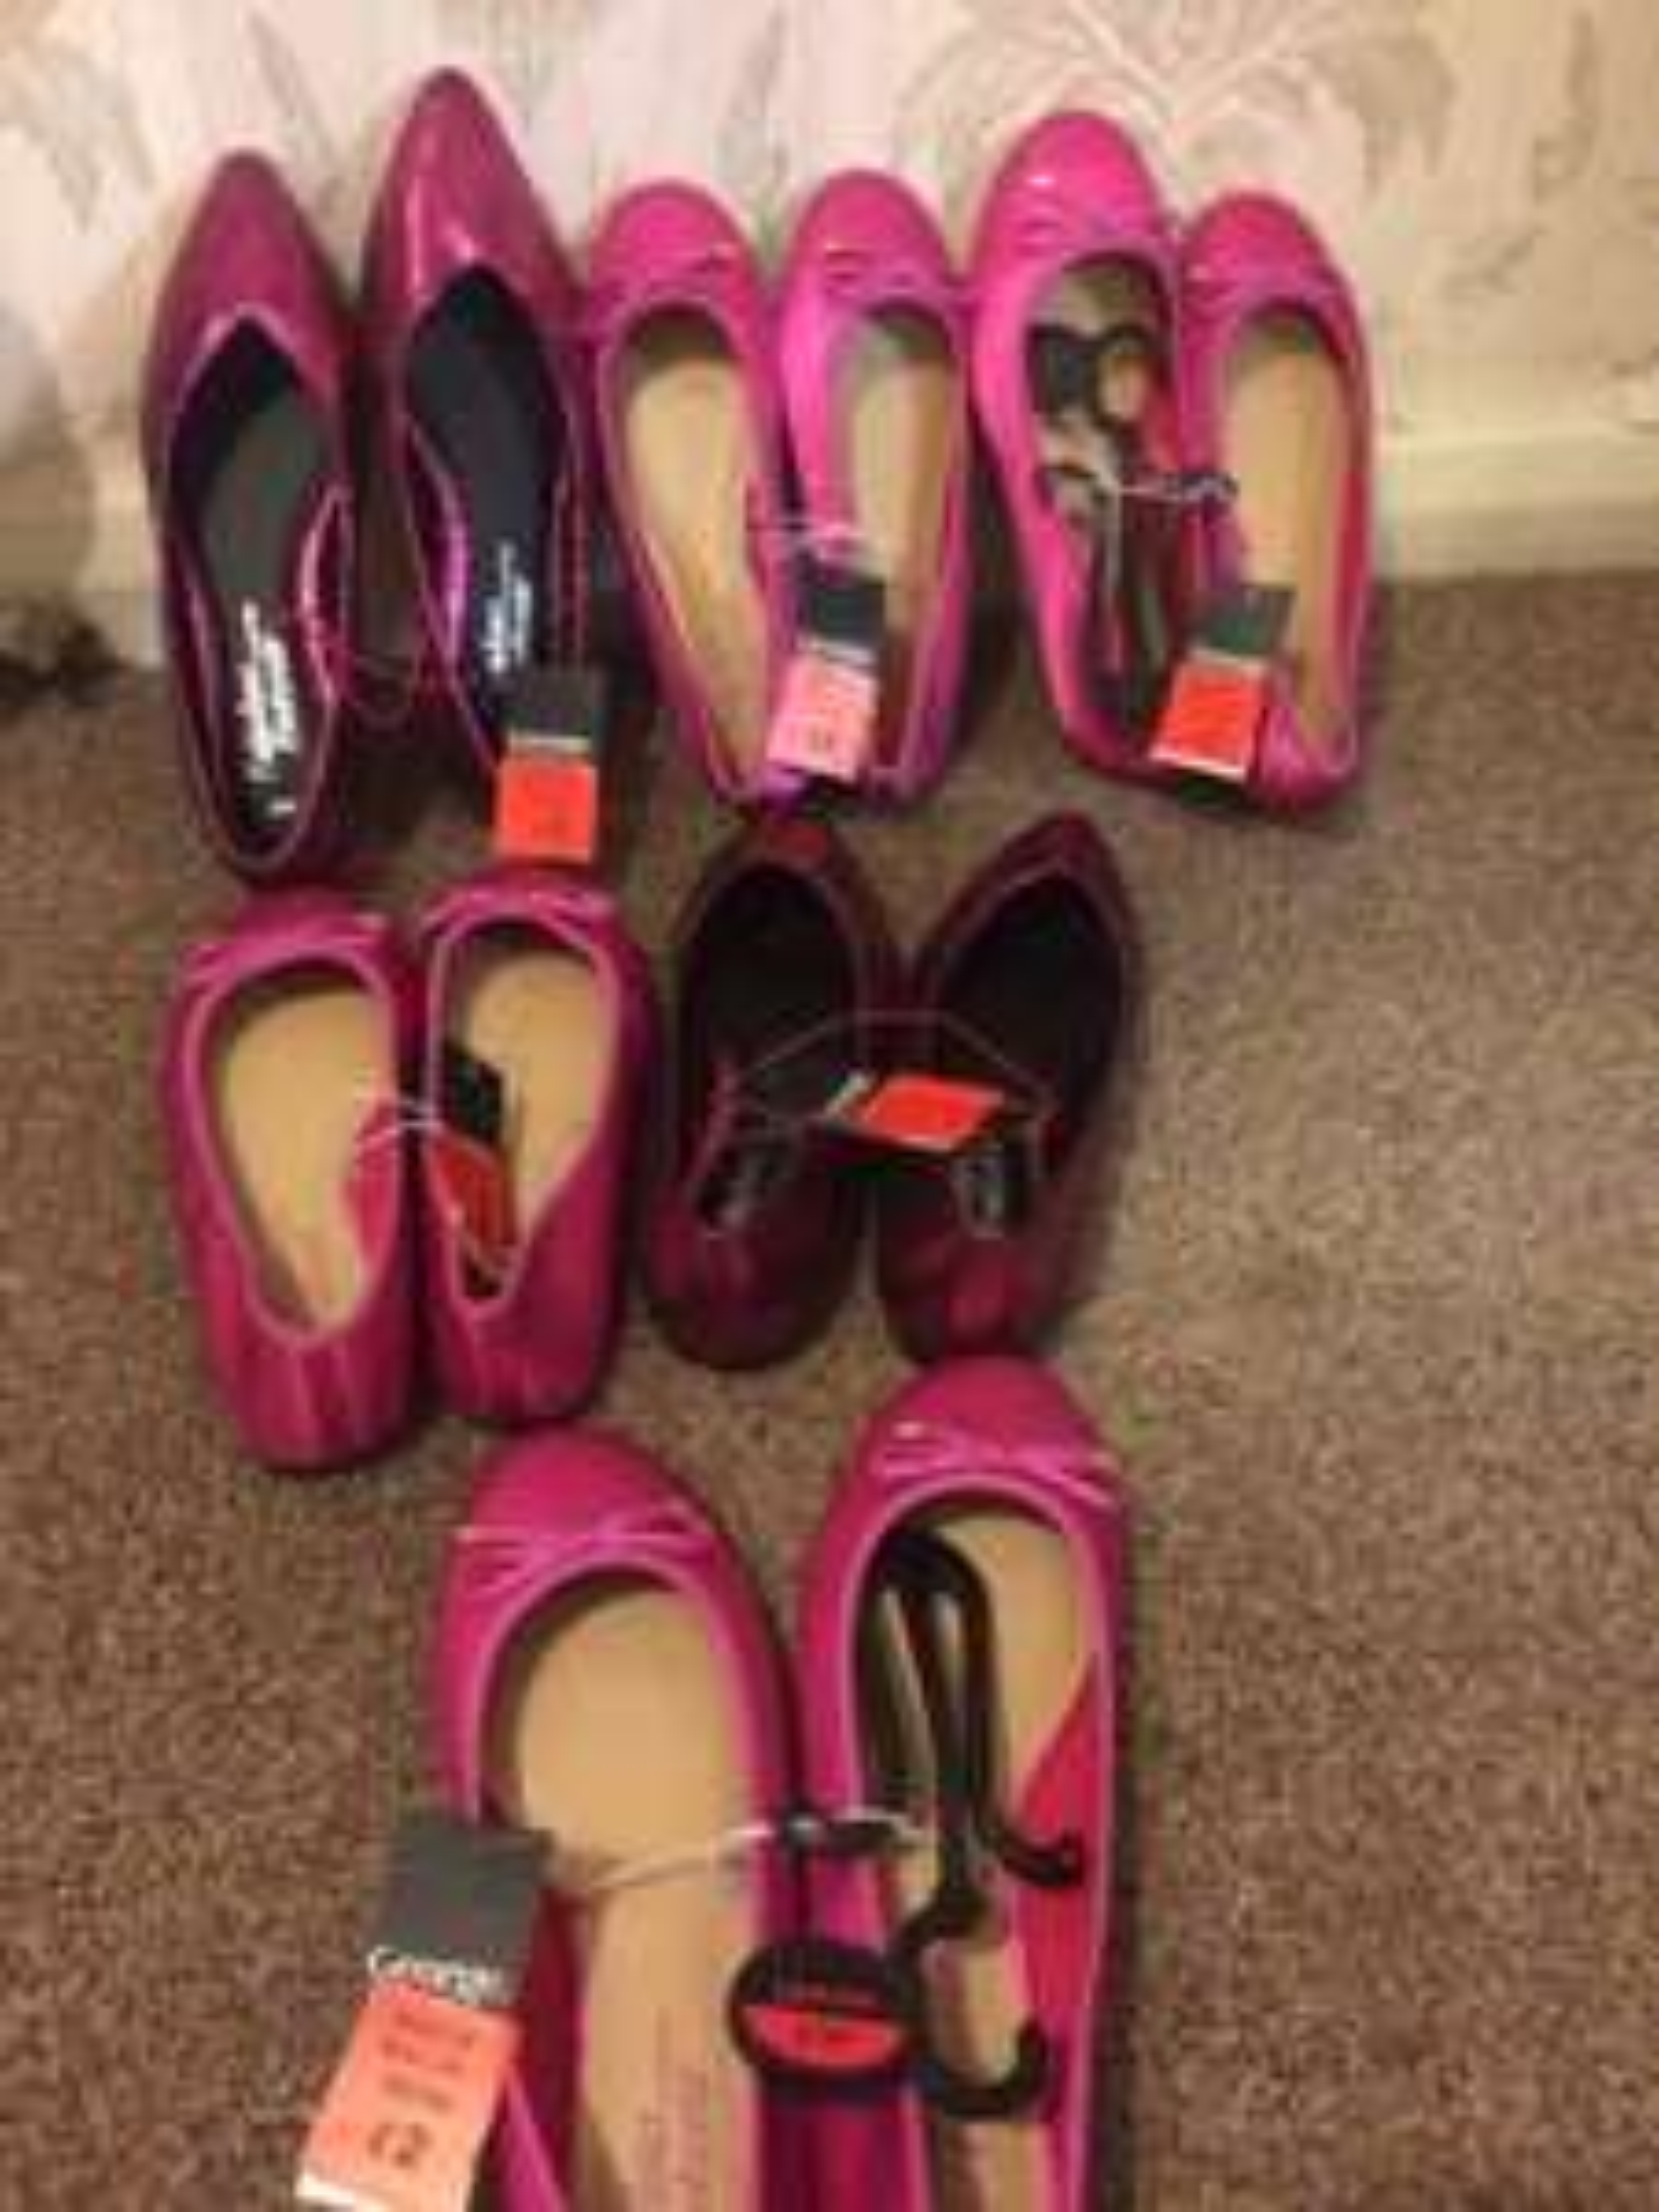 Fabulous Footwear (George) £2 down from £9 @ Asda instore